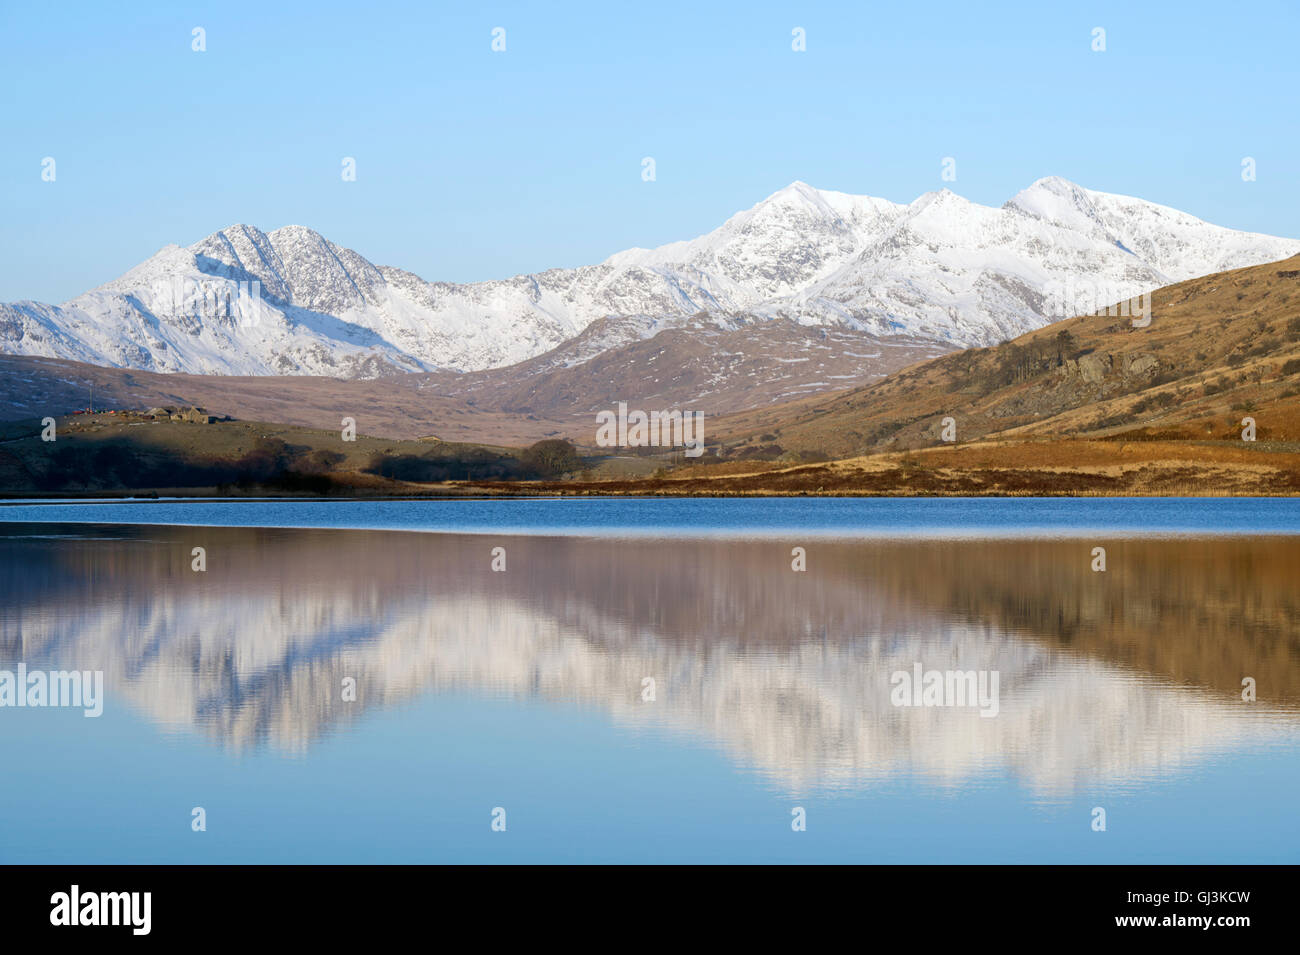 Snowdon mountain range, Snowdonia, North Wales, UK - Stock Image